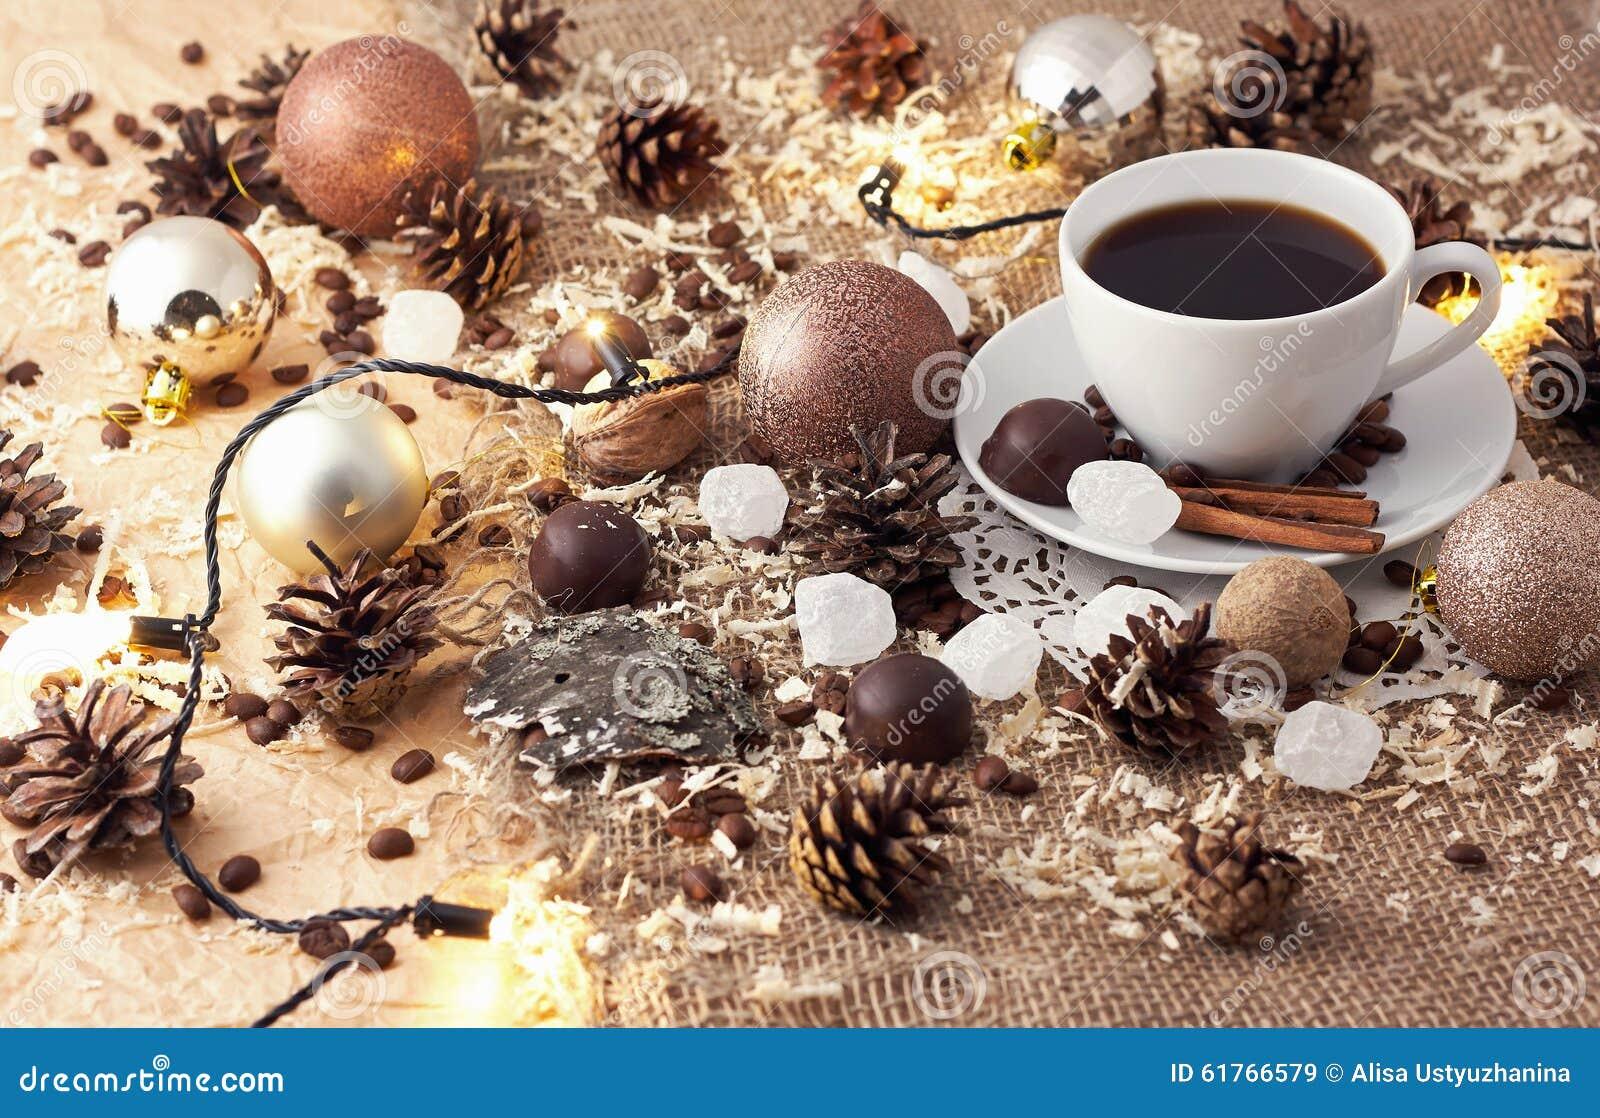 Merry Christmas Coffee Still Life Stock Photo - Image: 61766579